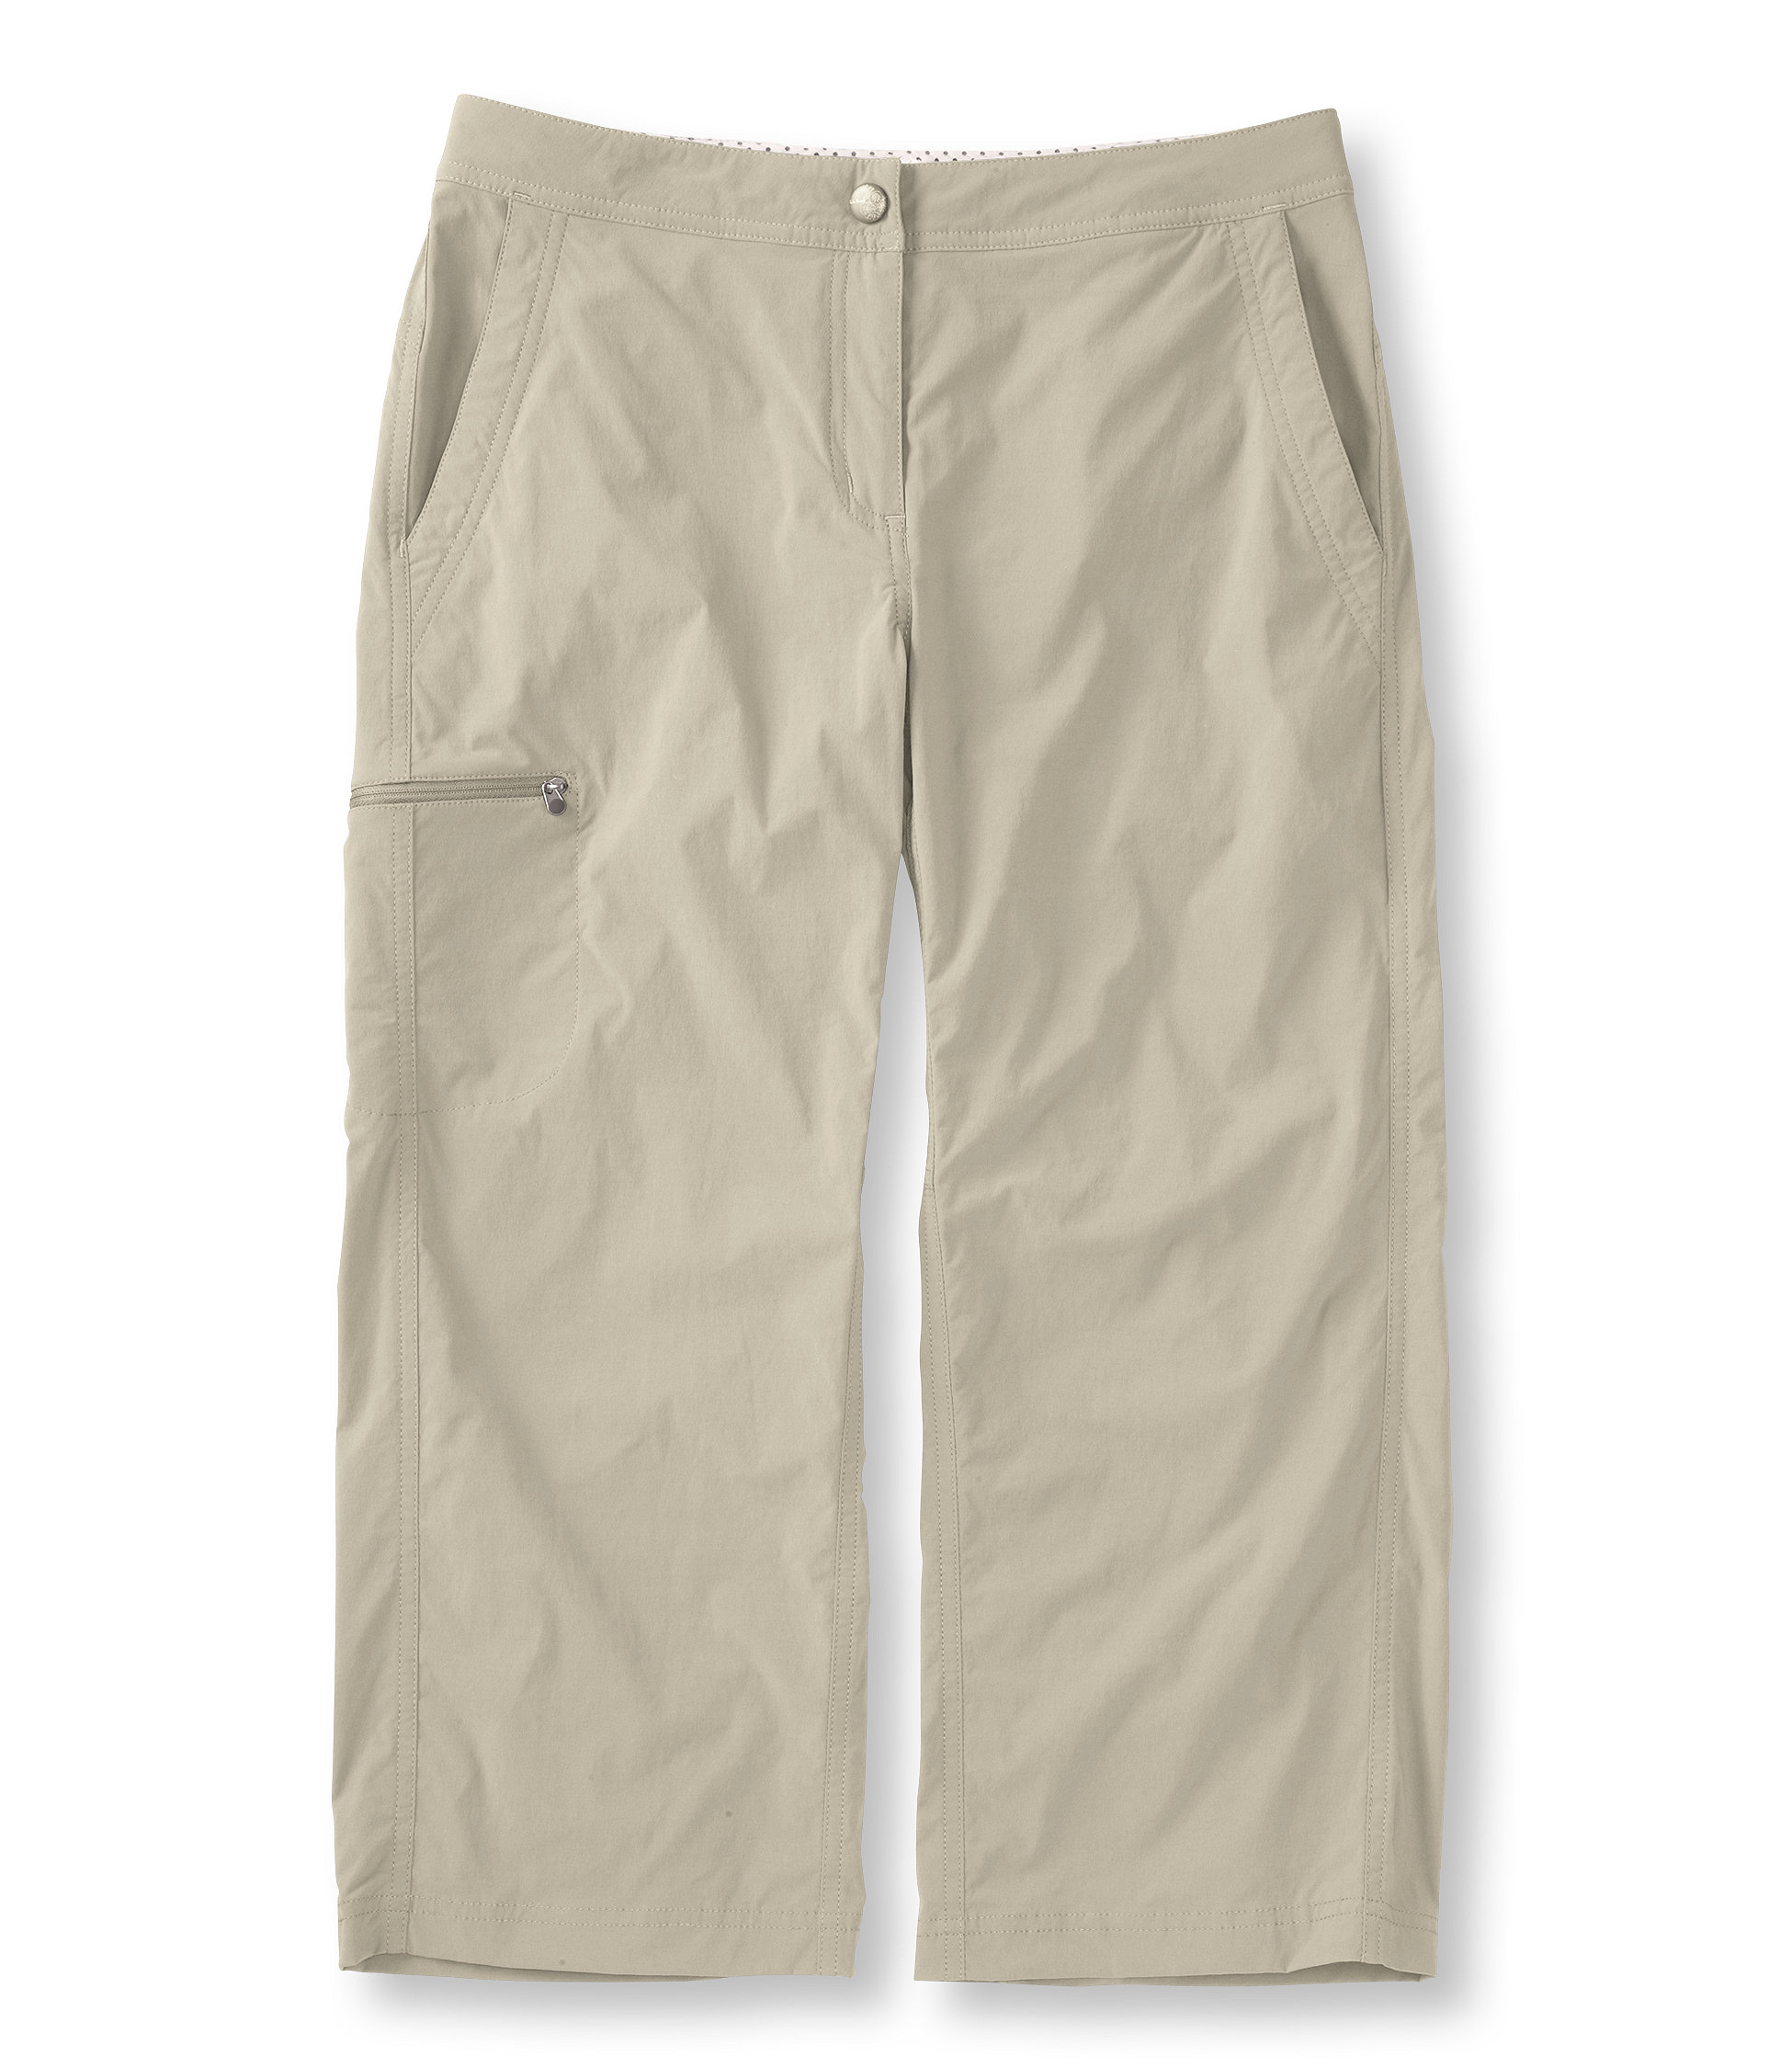 L.L.Bean Comfort Trail Pants, Cropped